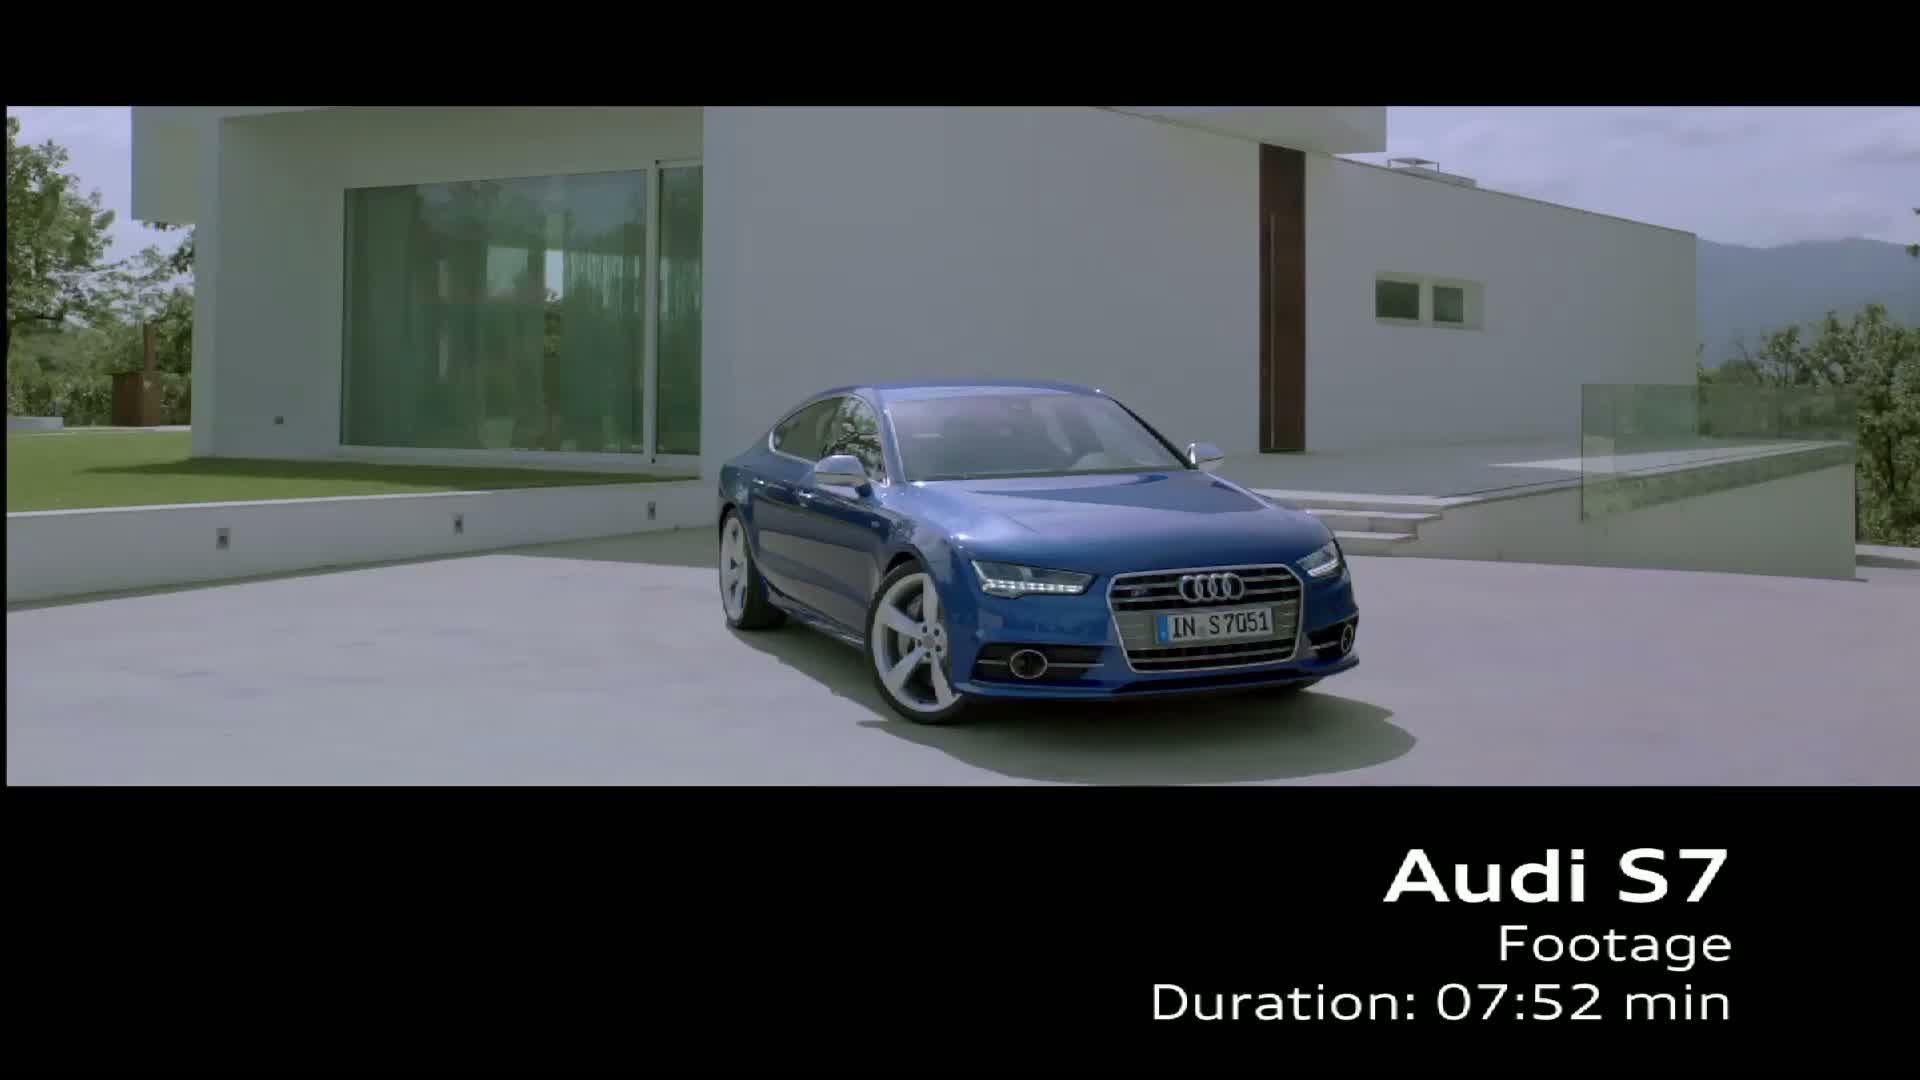 The Audi S7 Sportback - Footage